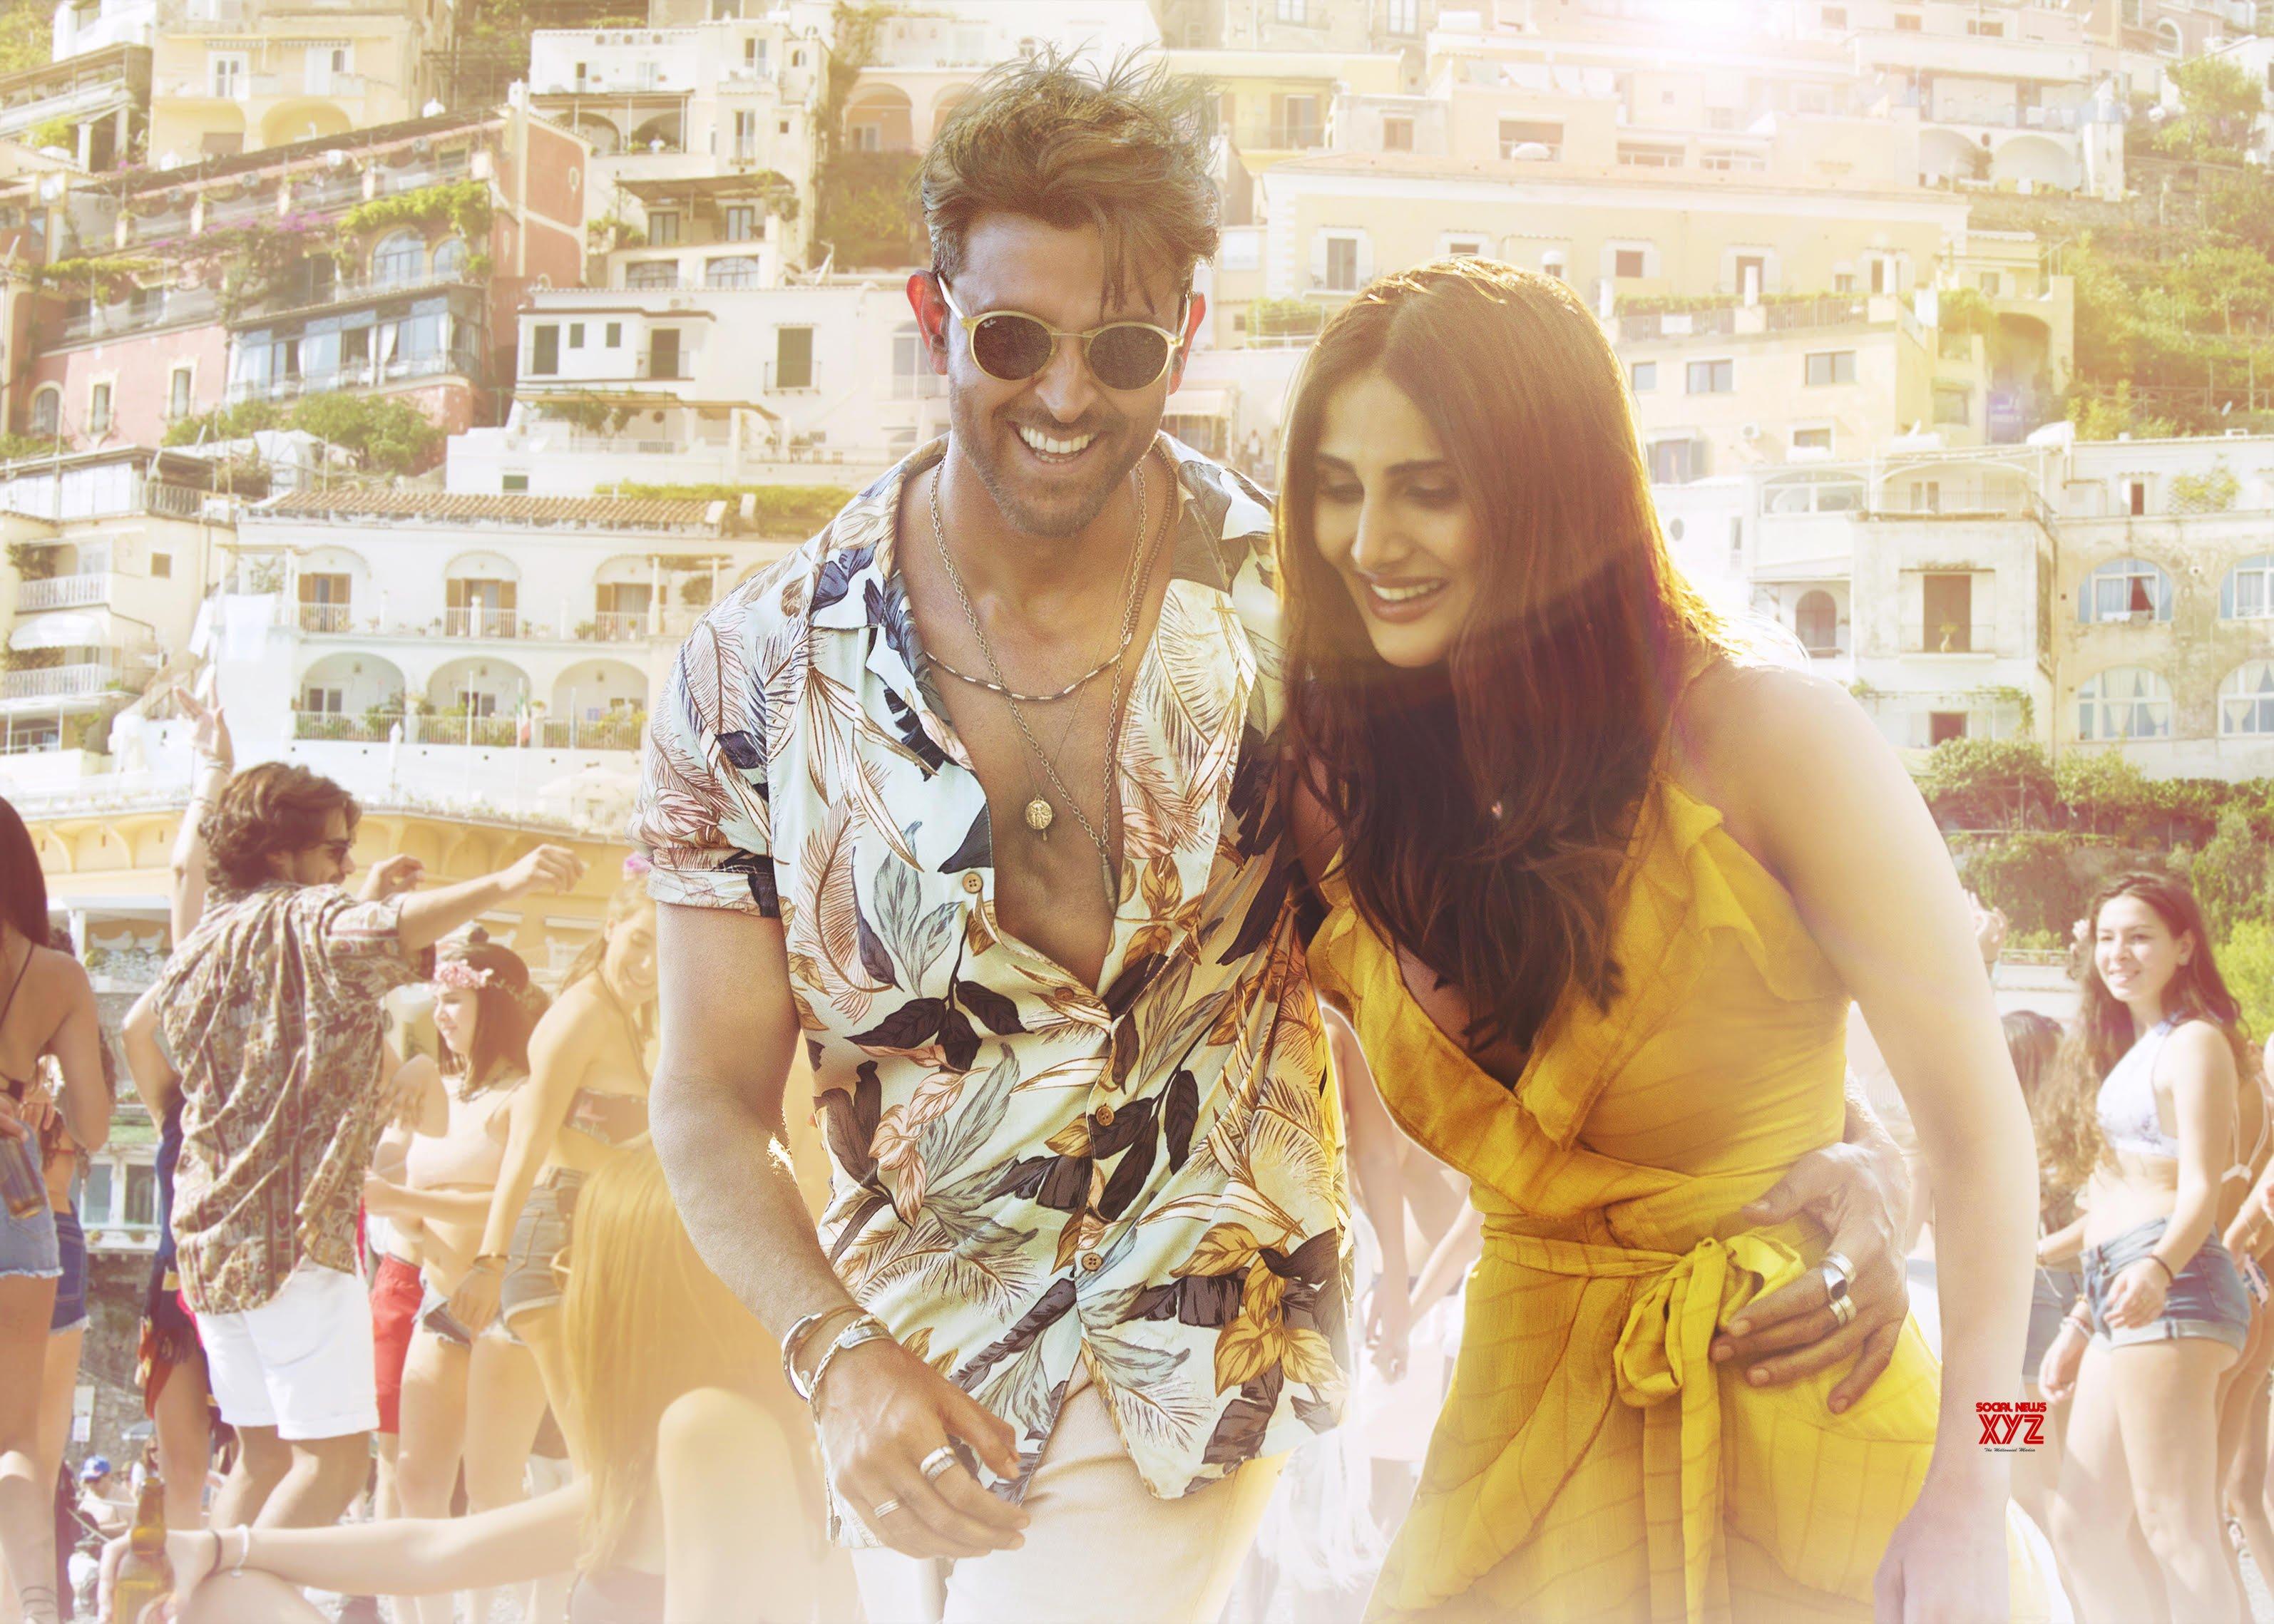 Hrithik Roshan And Vaani Kapoor Burn Up The Dance Floor In